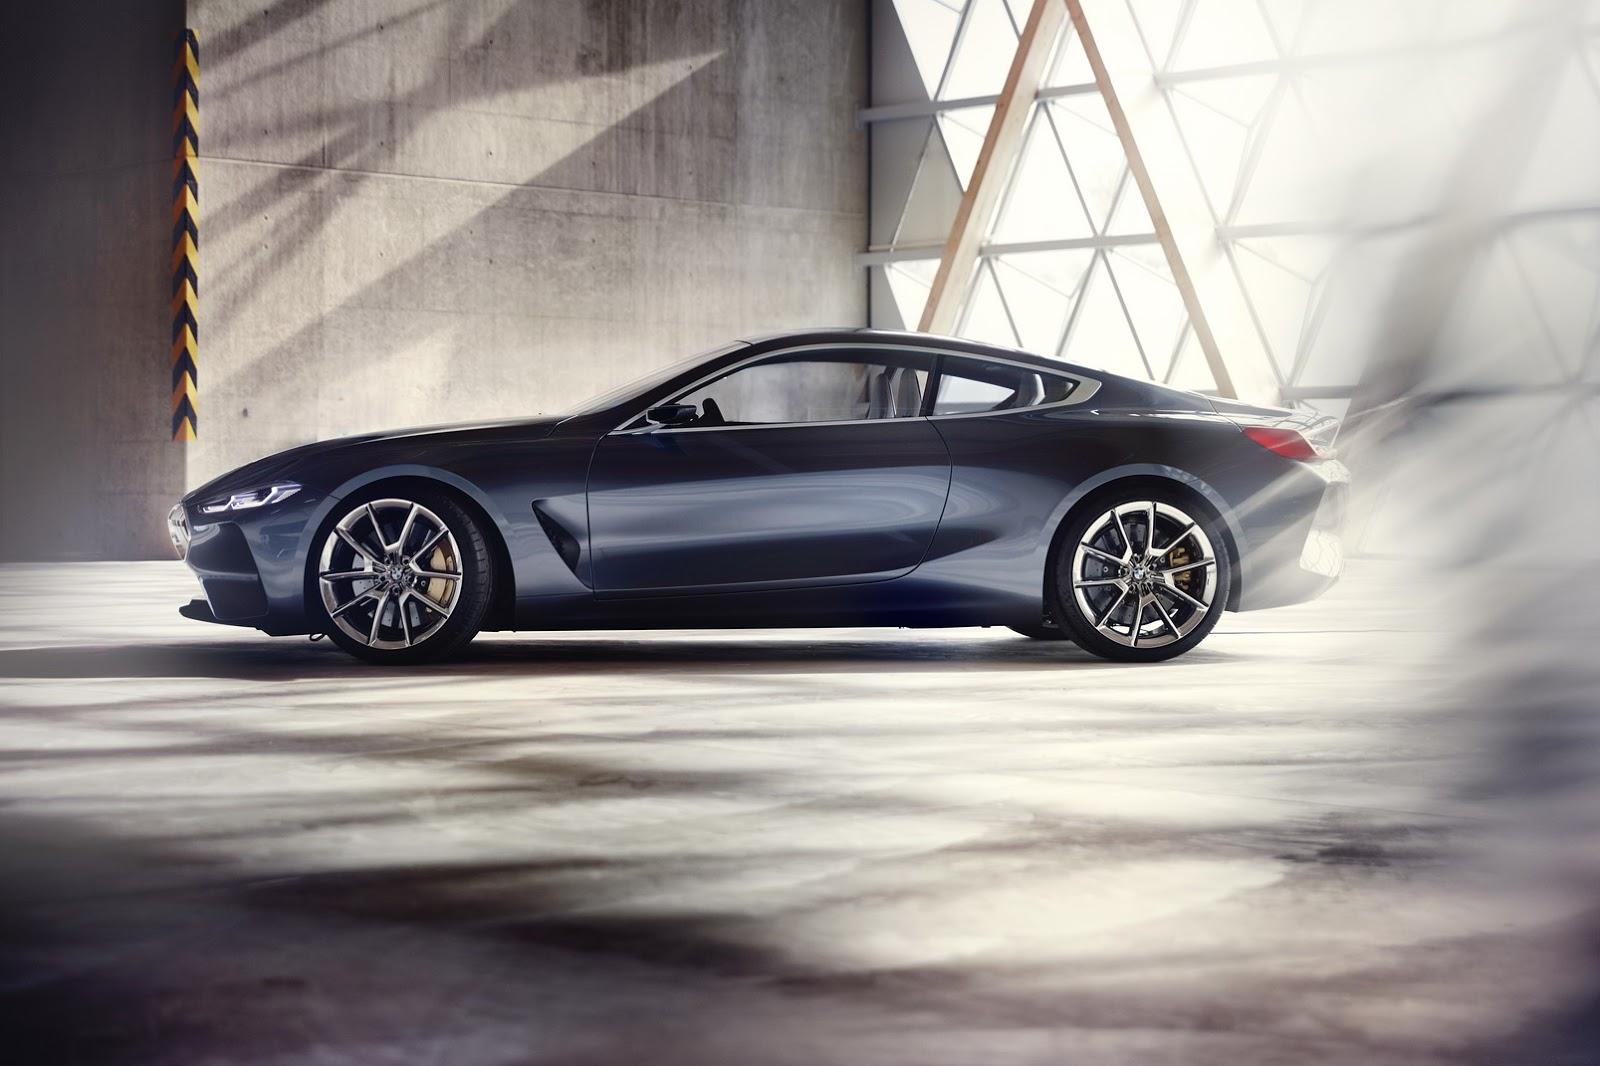 BMW-2019-8-Series-Concept-11